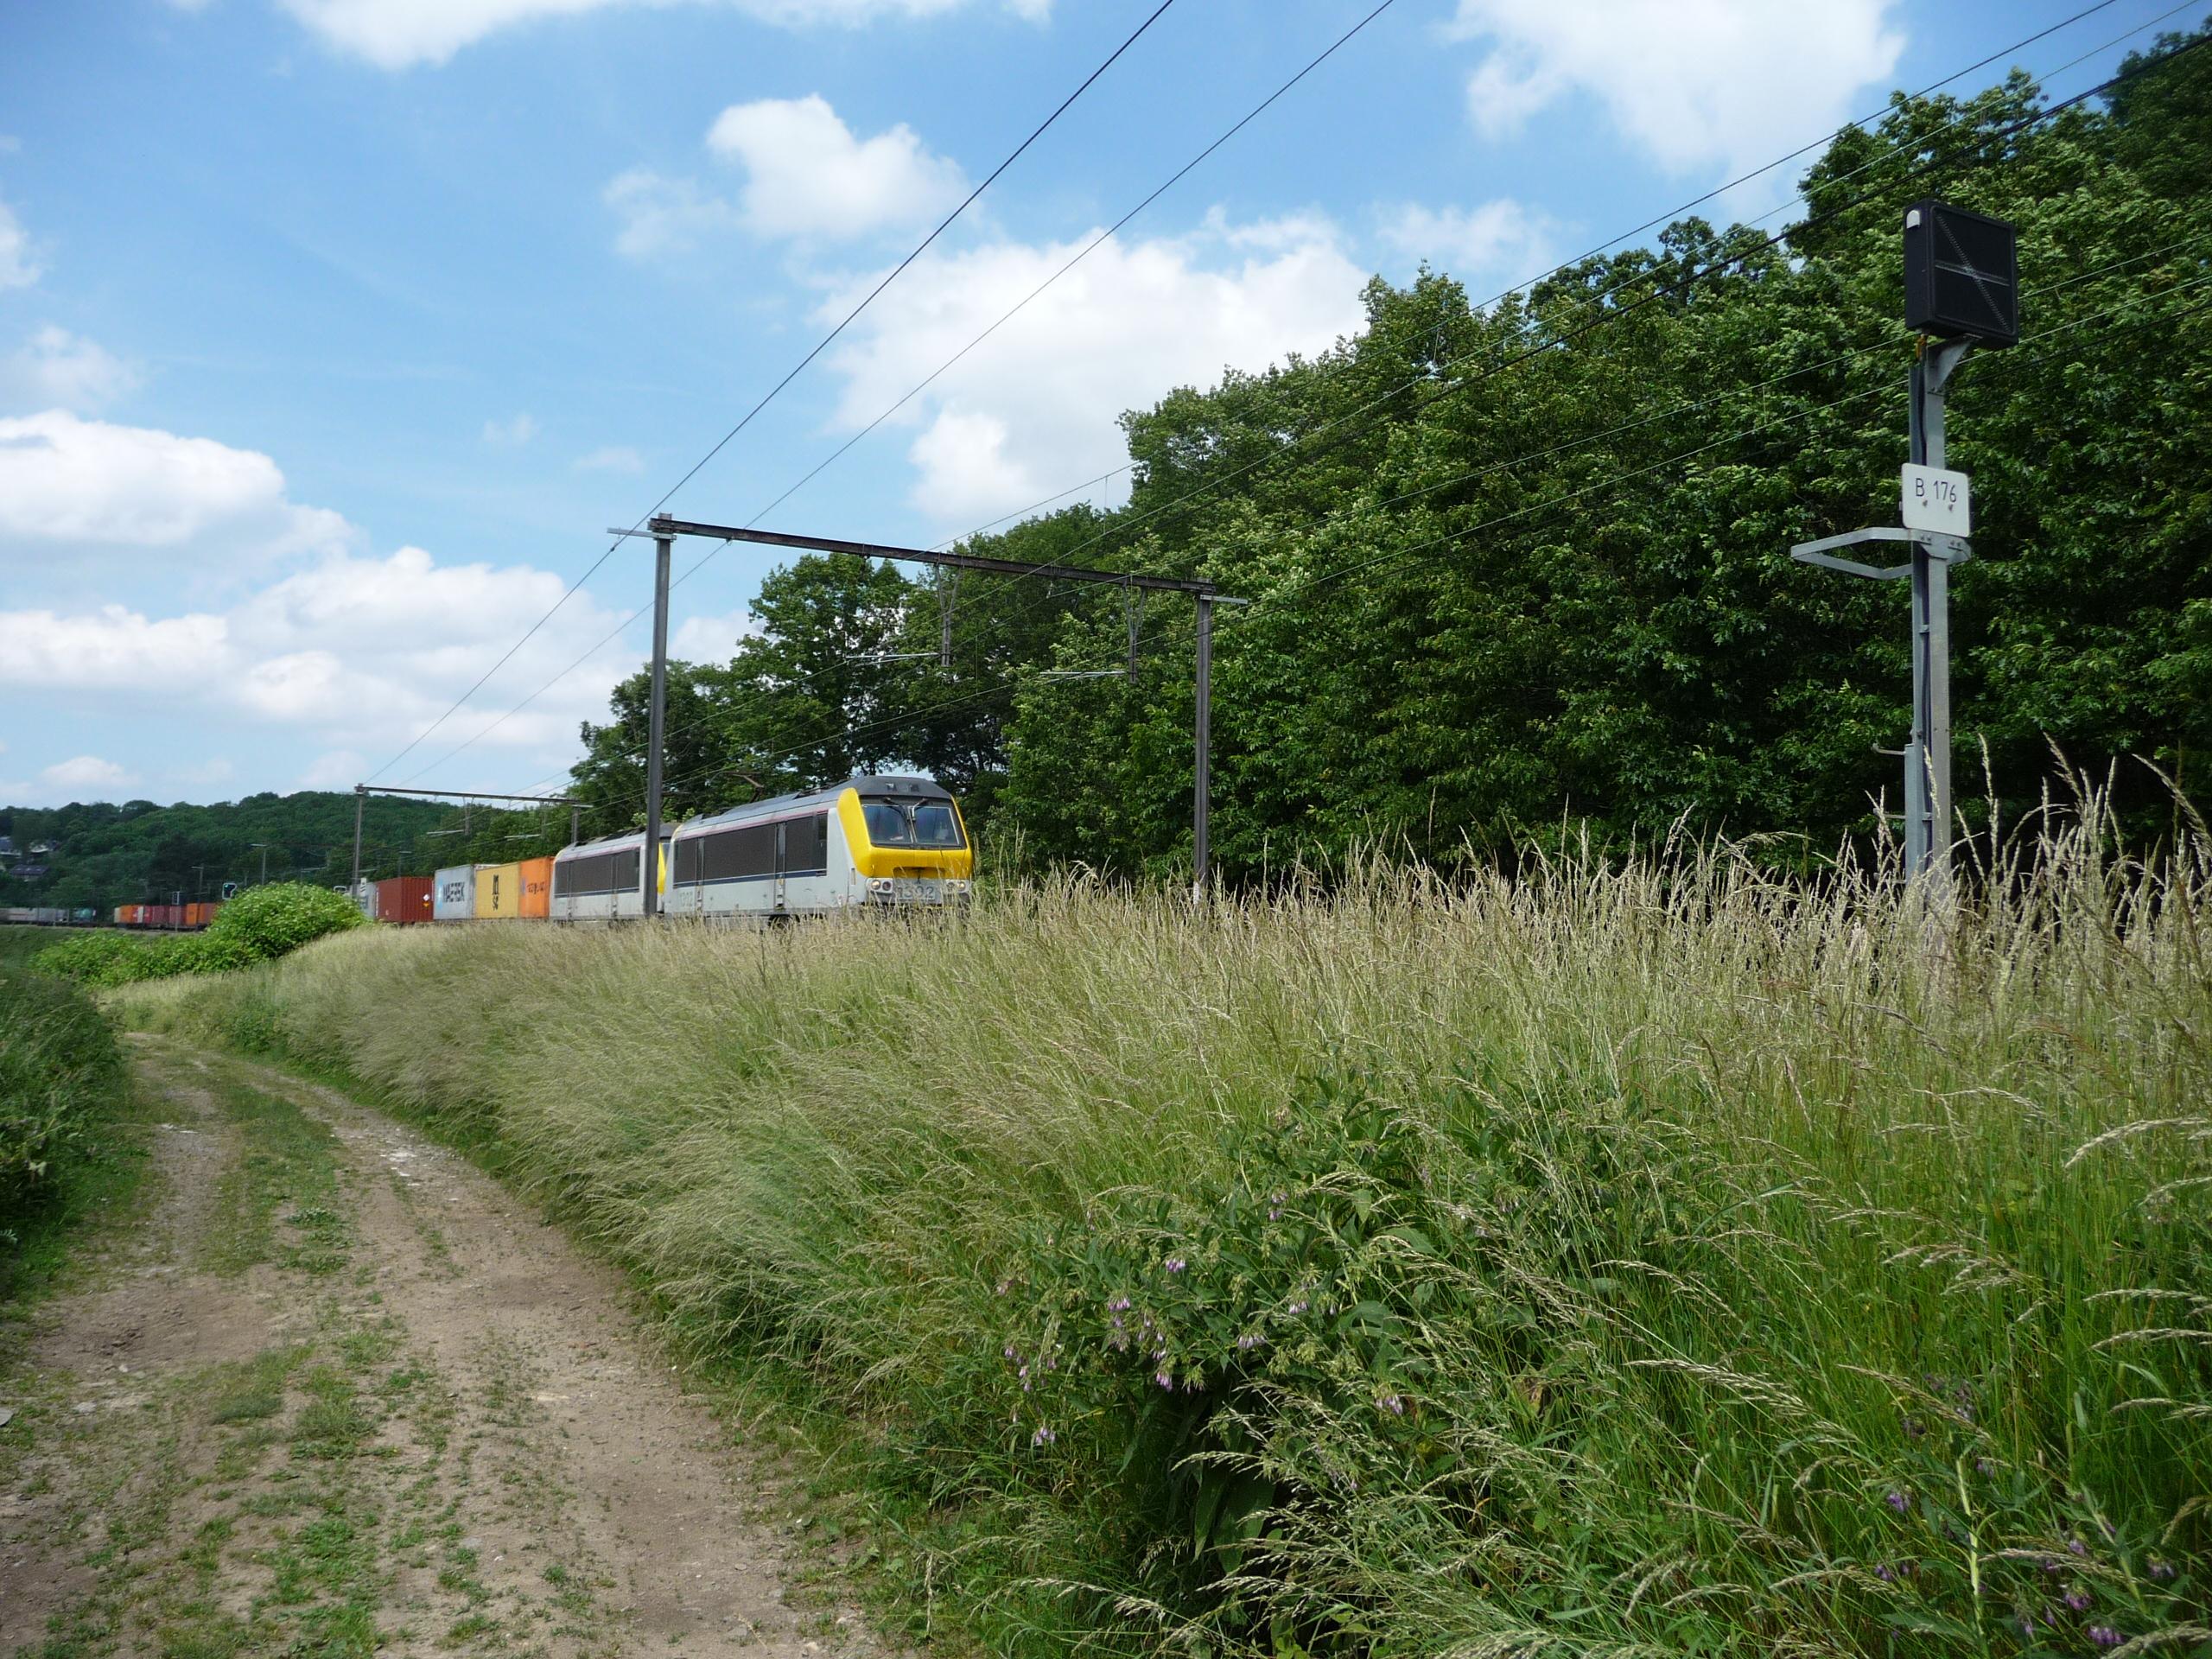 Railyway and train near Archennes